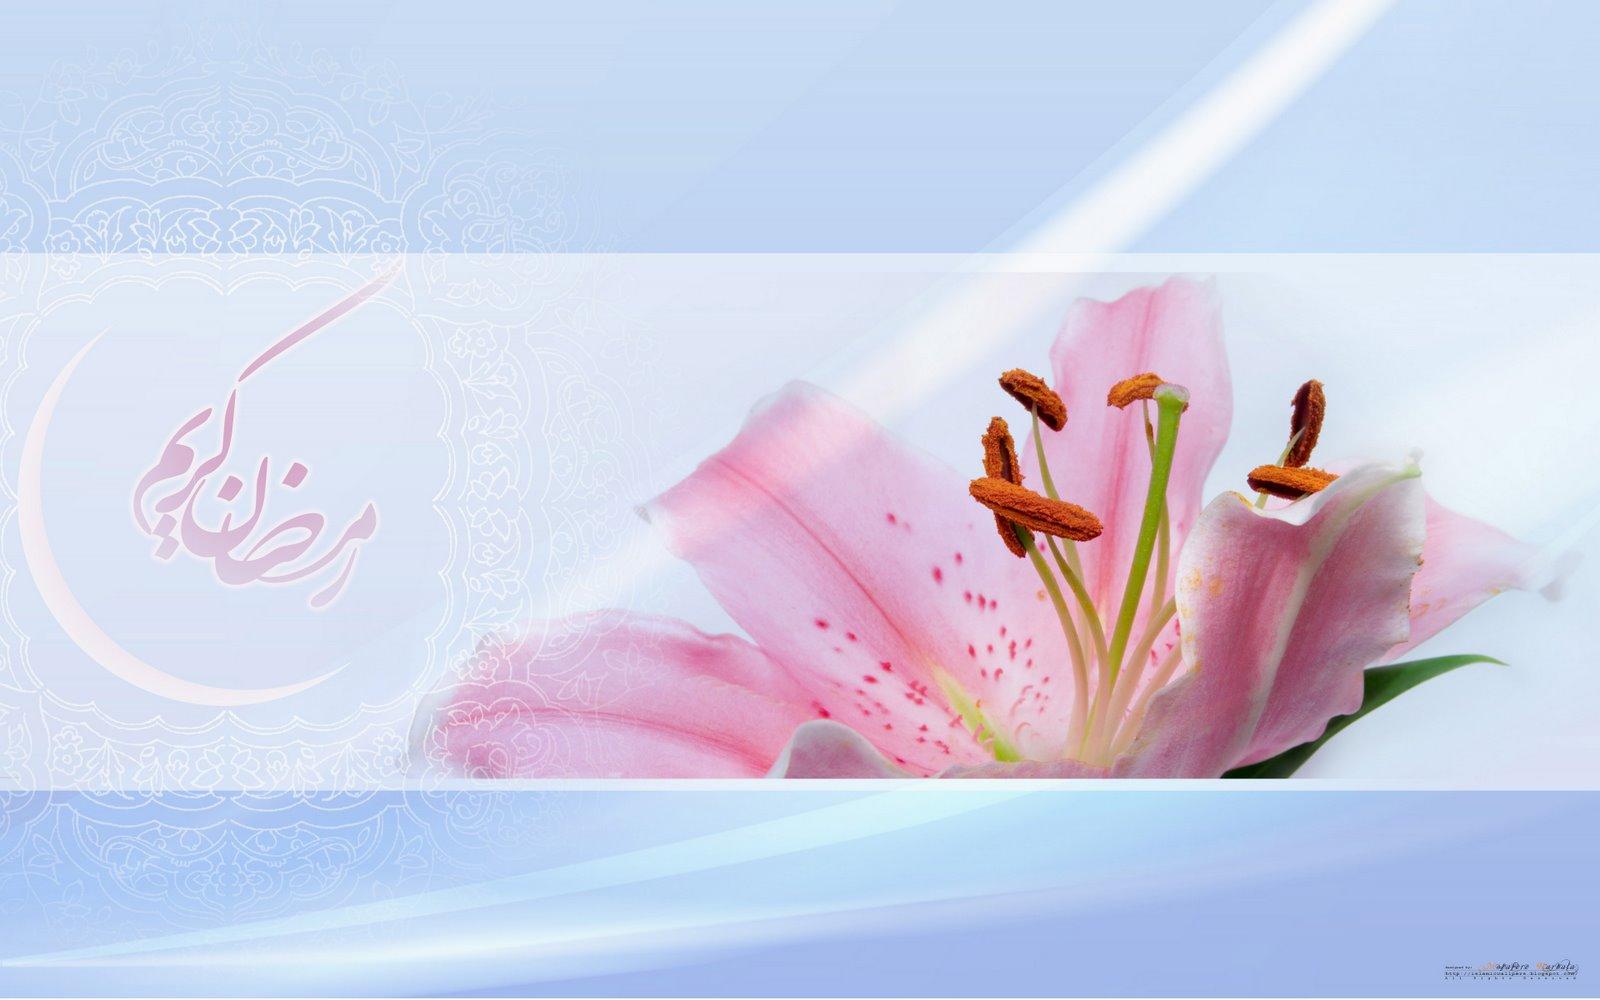 http://2.bp.blogspot.com/_HeMkQFoSCkY/TGExLsVc8KI/AAAAAAAACpw/TzIWQO-QSgY/s1600/ramzan-wallpaper-3.jpg